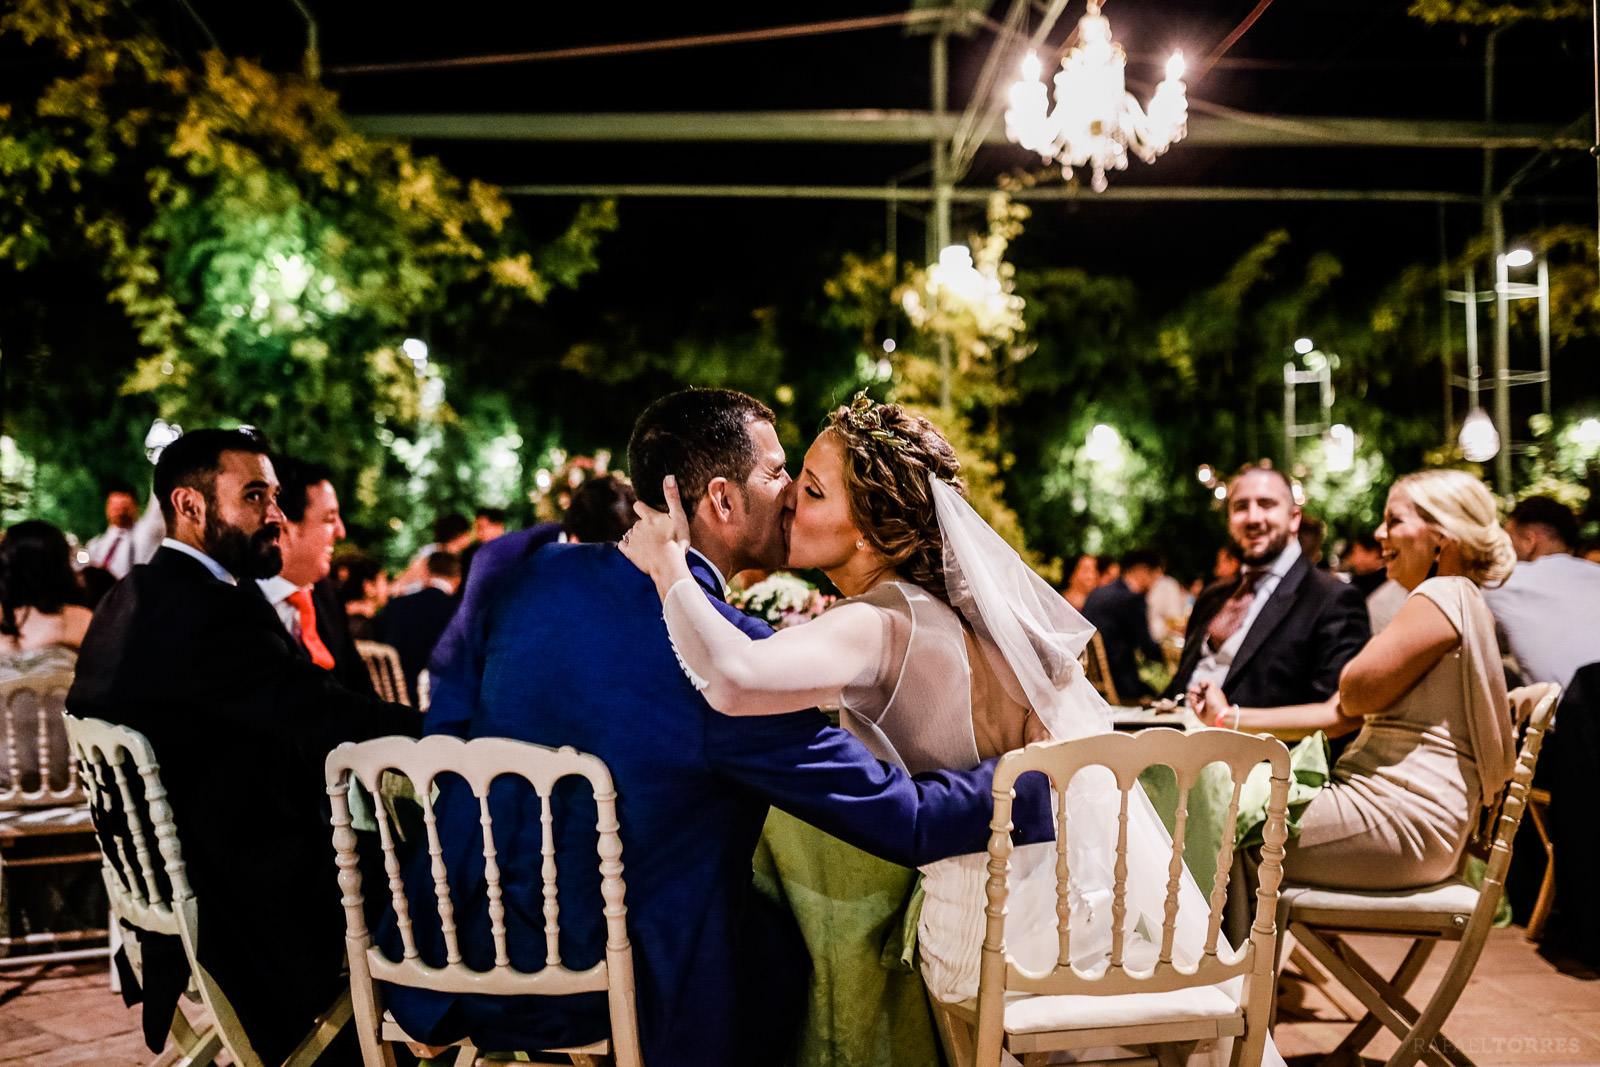 Rafael+Torres+fotografo+bodas+sevilla+madrid+barcelona+wedding+photographer+bodas+diferentes+bodaensevilla+molinillos+fotografo+hacienda+oran+alfonso+wedding+photographer-31.jpg